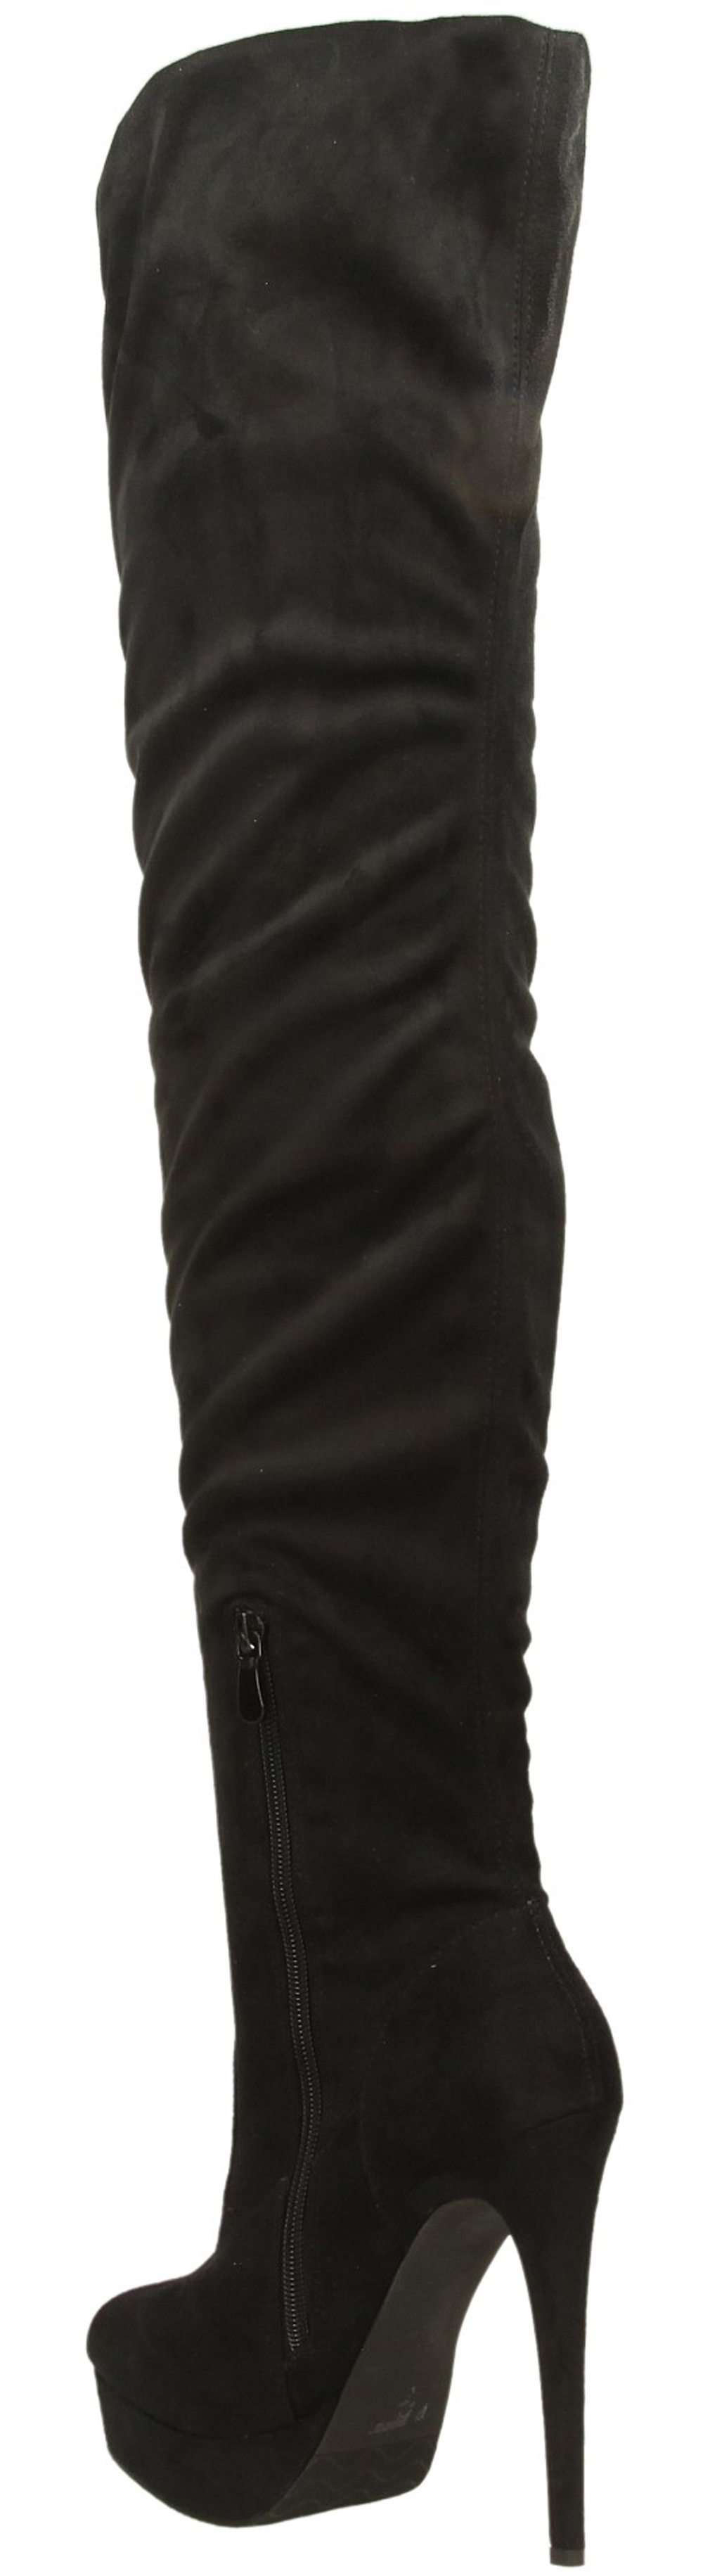 KOZAKI BLINK 101969-AW-01 kolor czarny